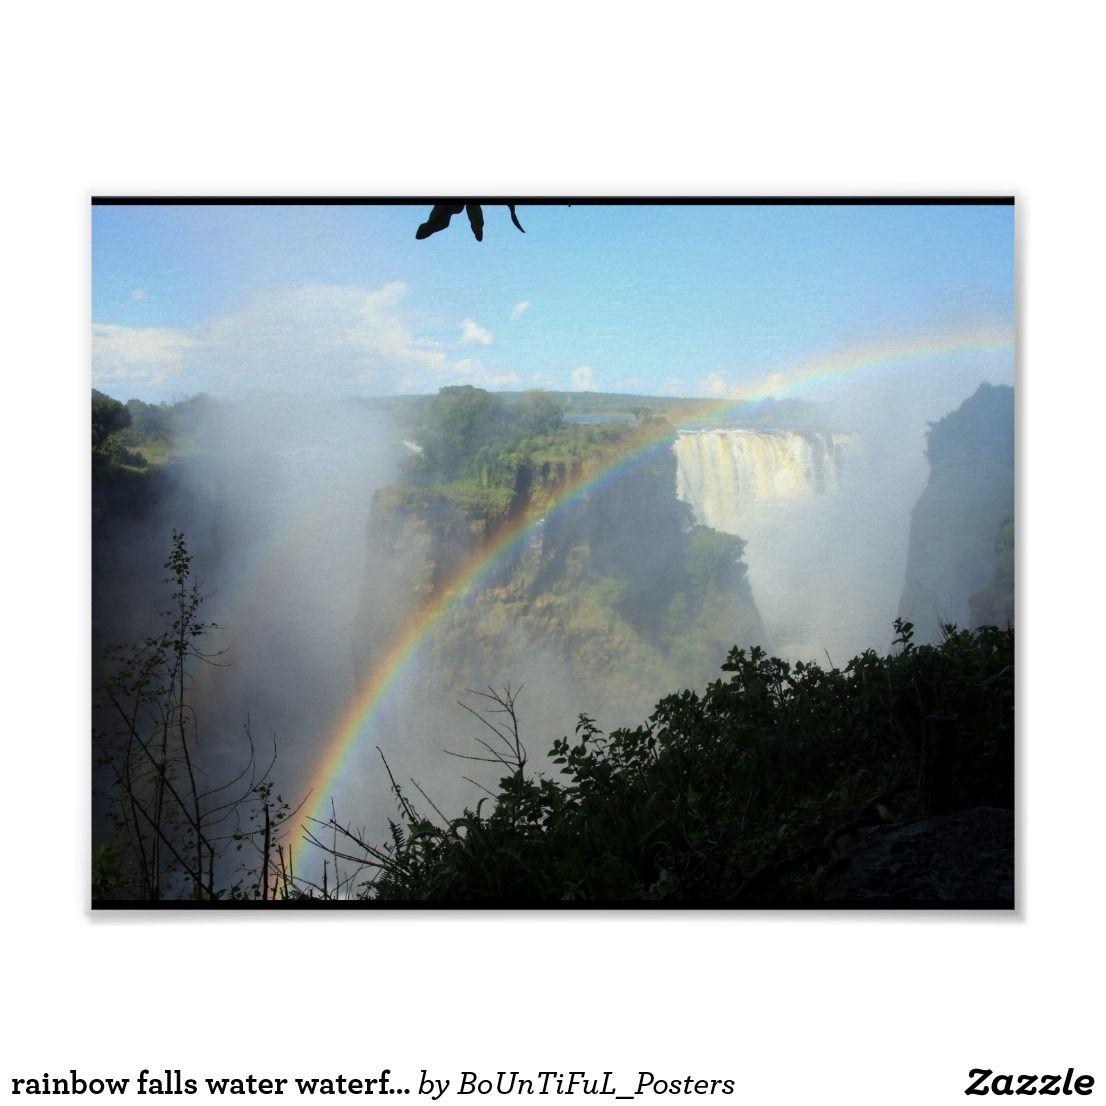 rainbow falls water waterfall park gold golden poster | Zazzle.com #rainbowfalls